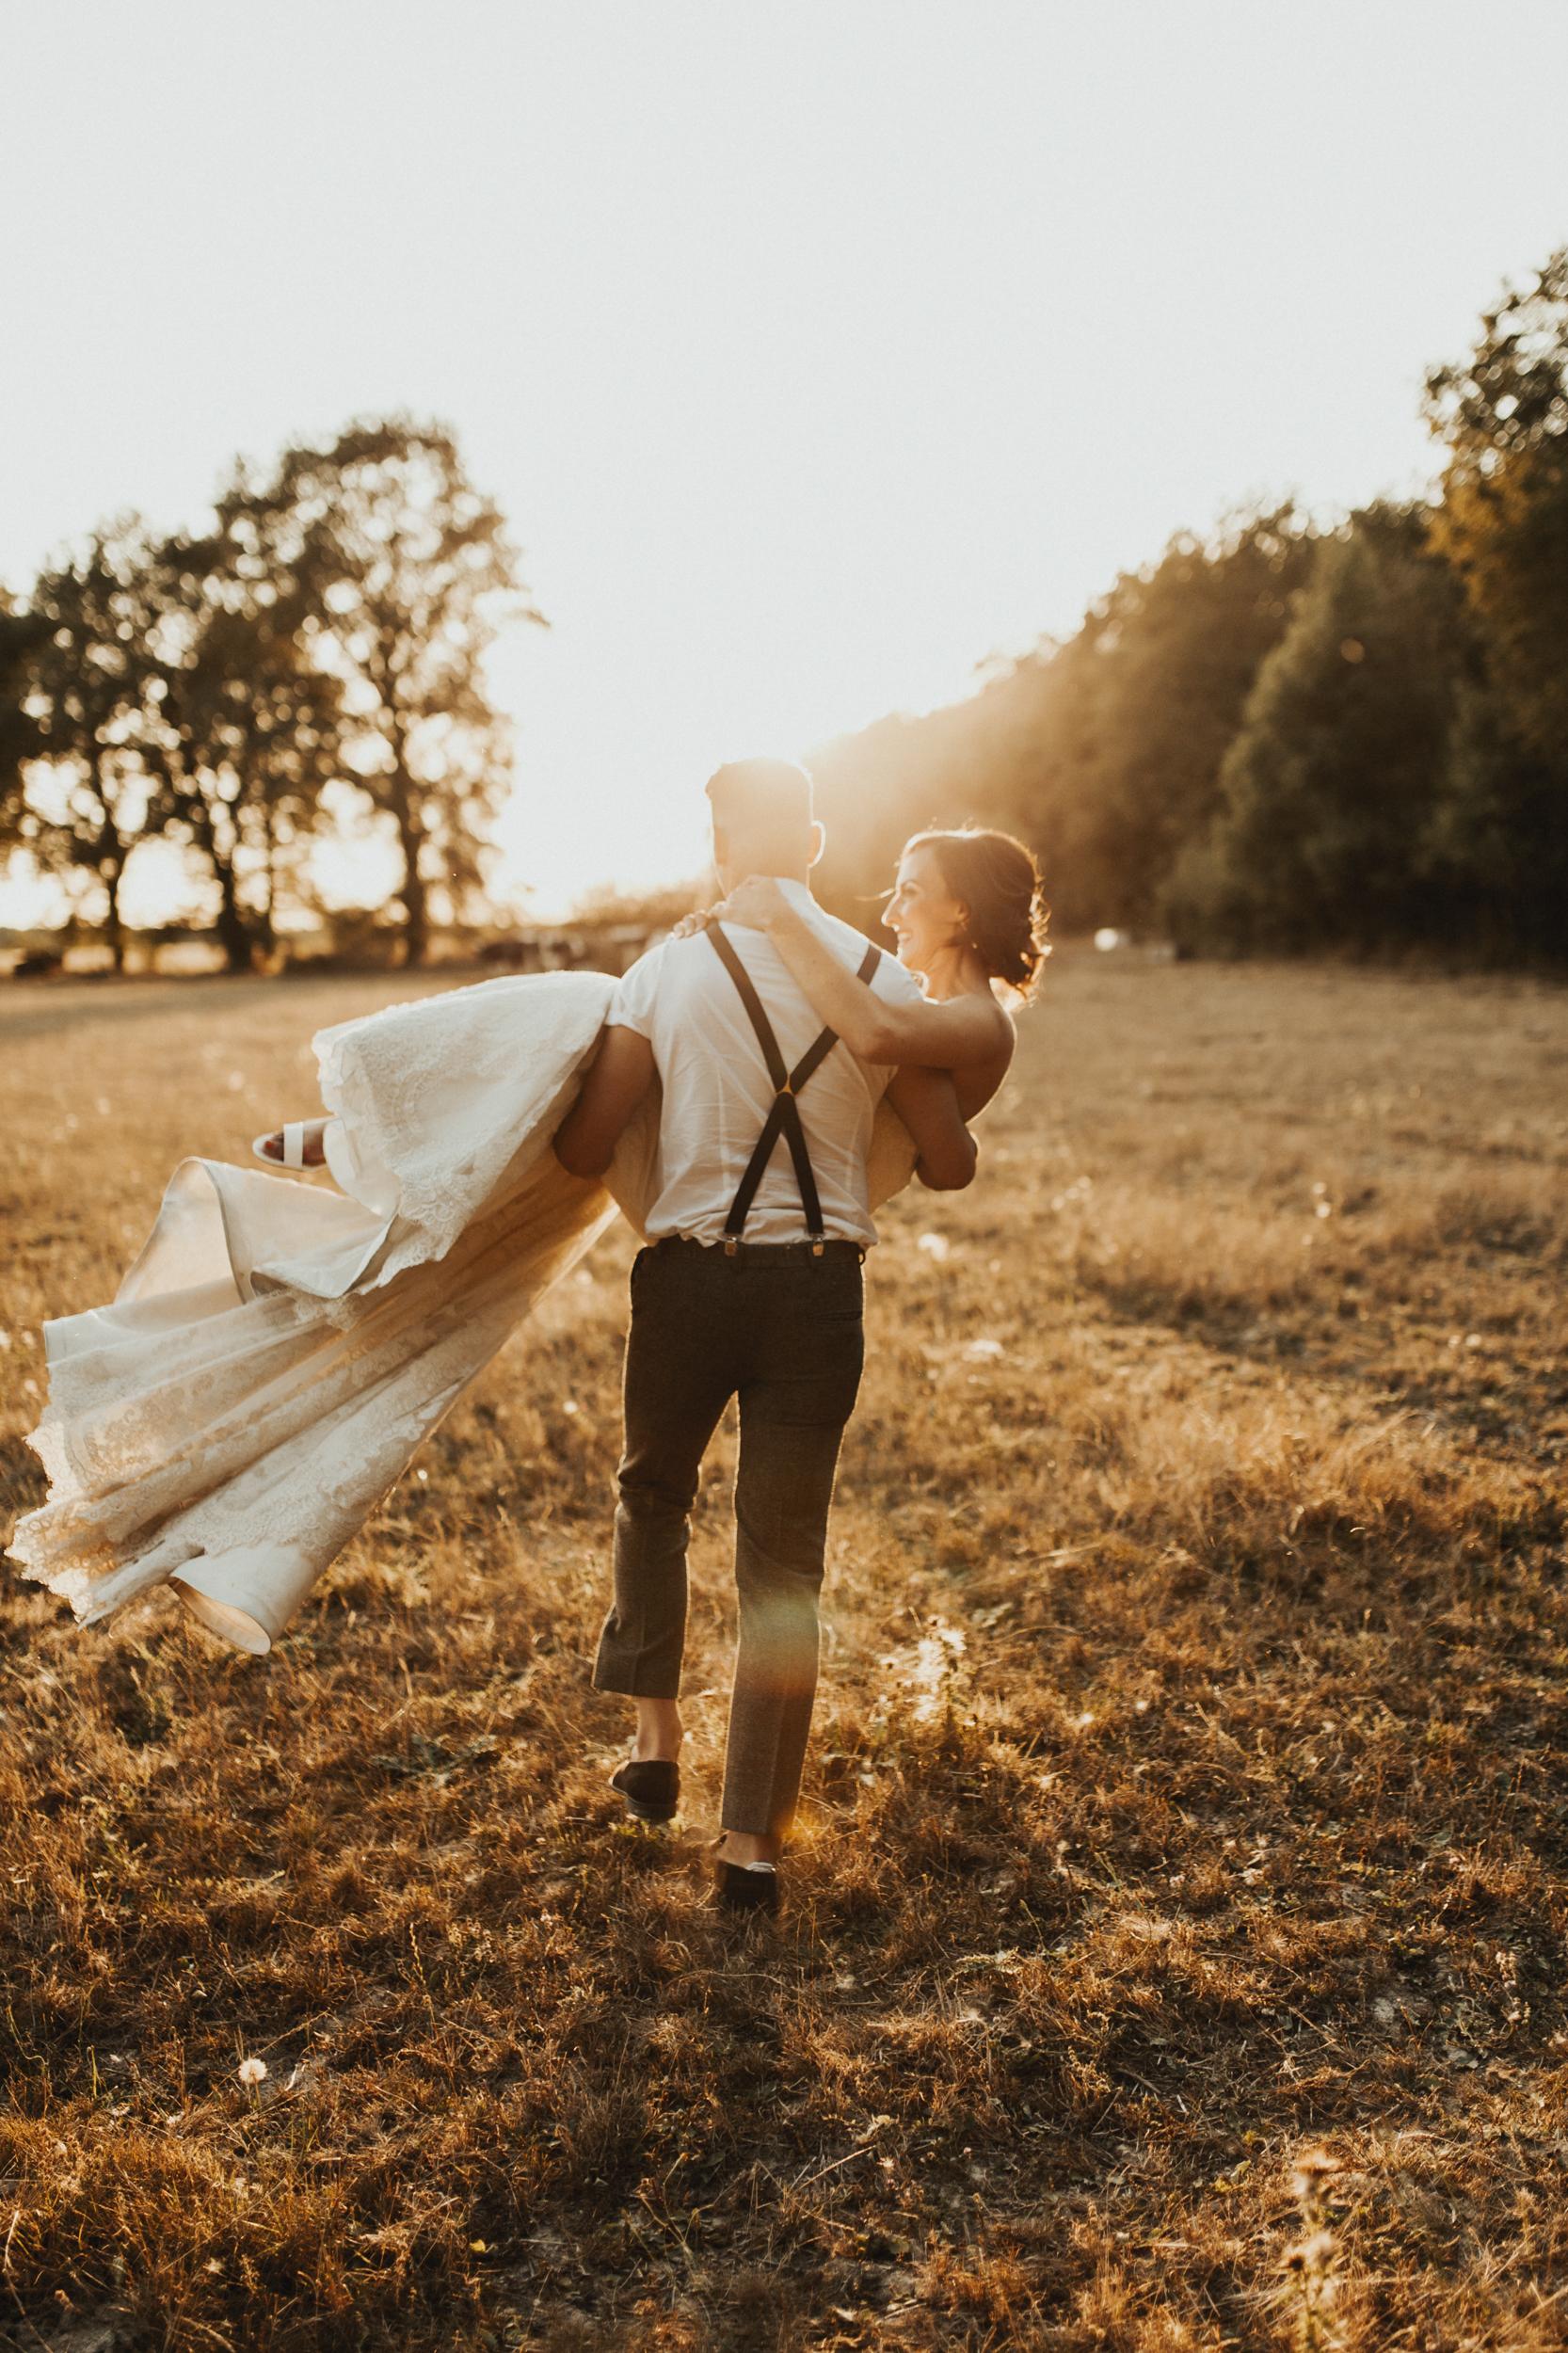 Amy-Zac-Destination-Wedding-France-Manoir-Foulquetiere-Darina-Stoda-Photography-88.jpg